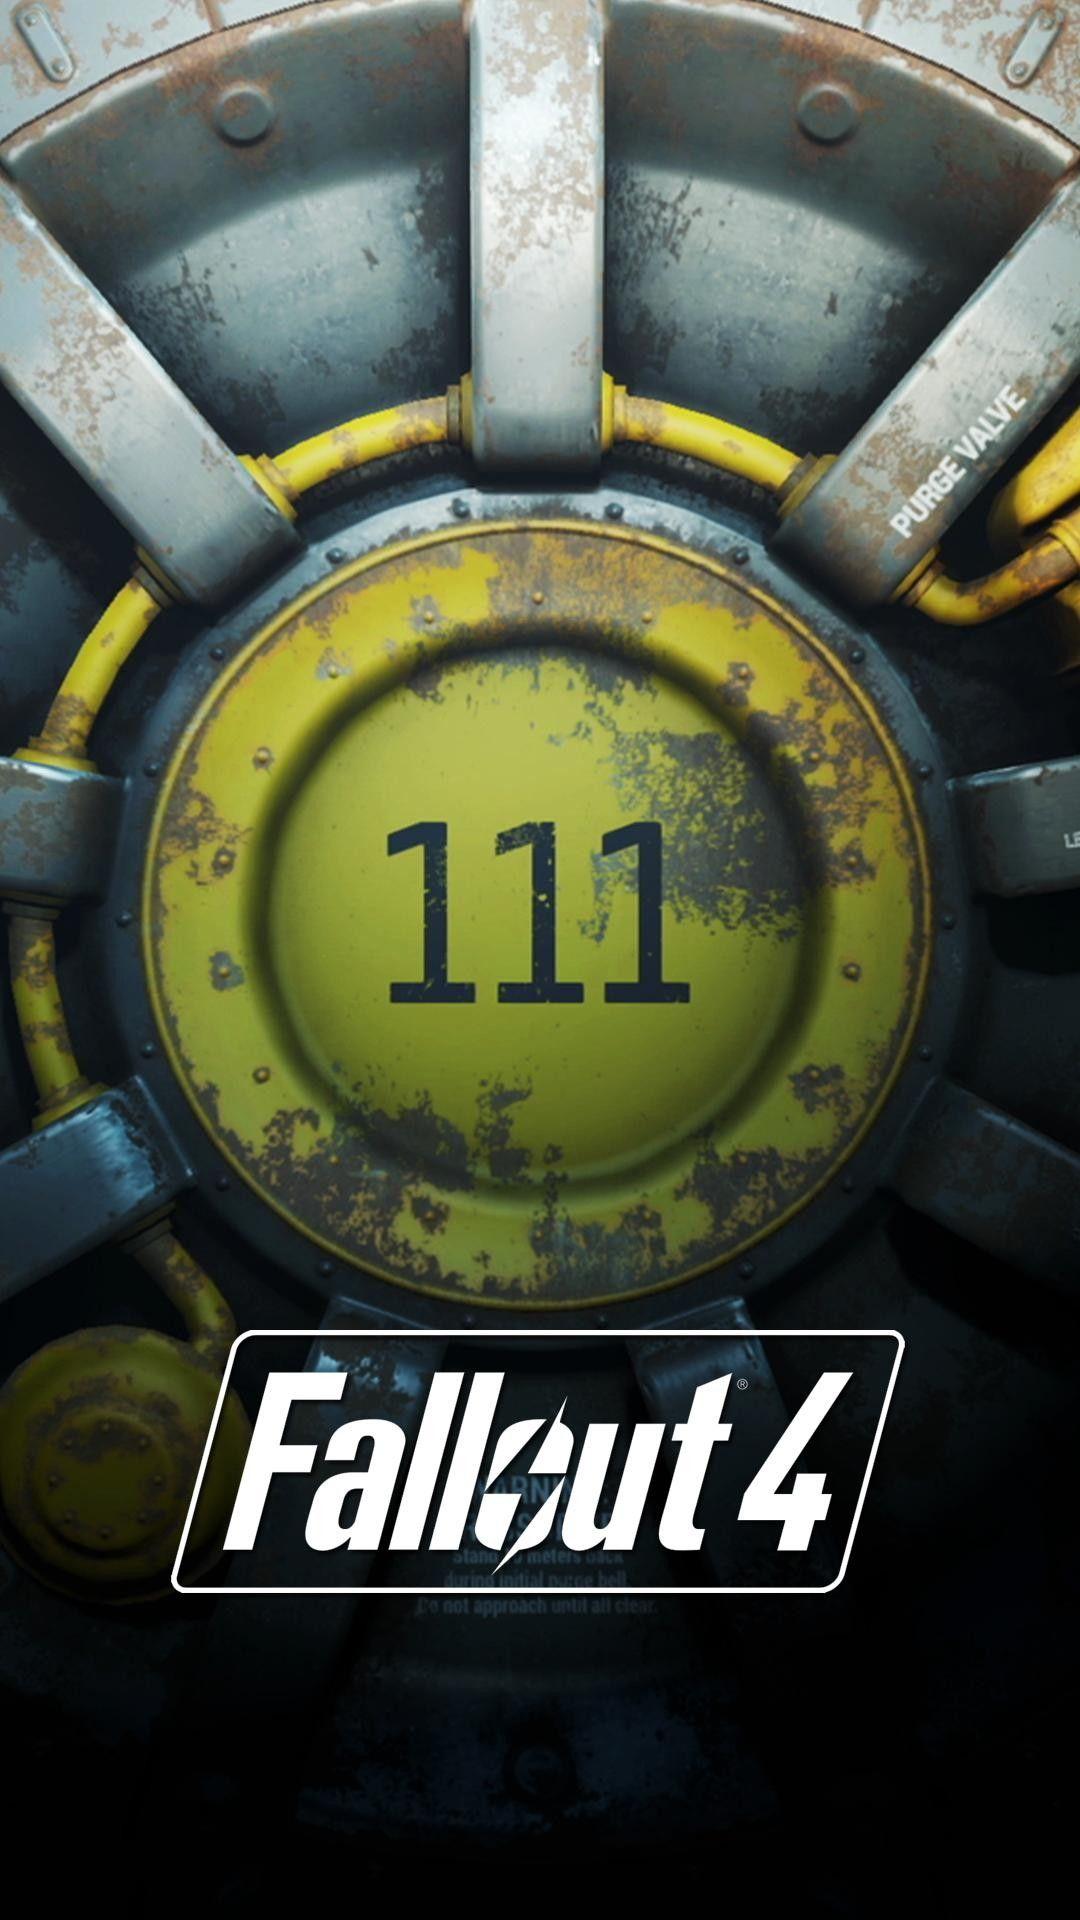 Fallout 4 Iphone Wallpaper Hd Di 2020